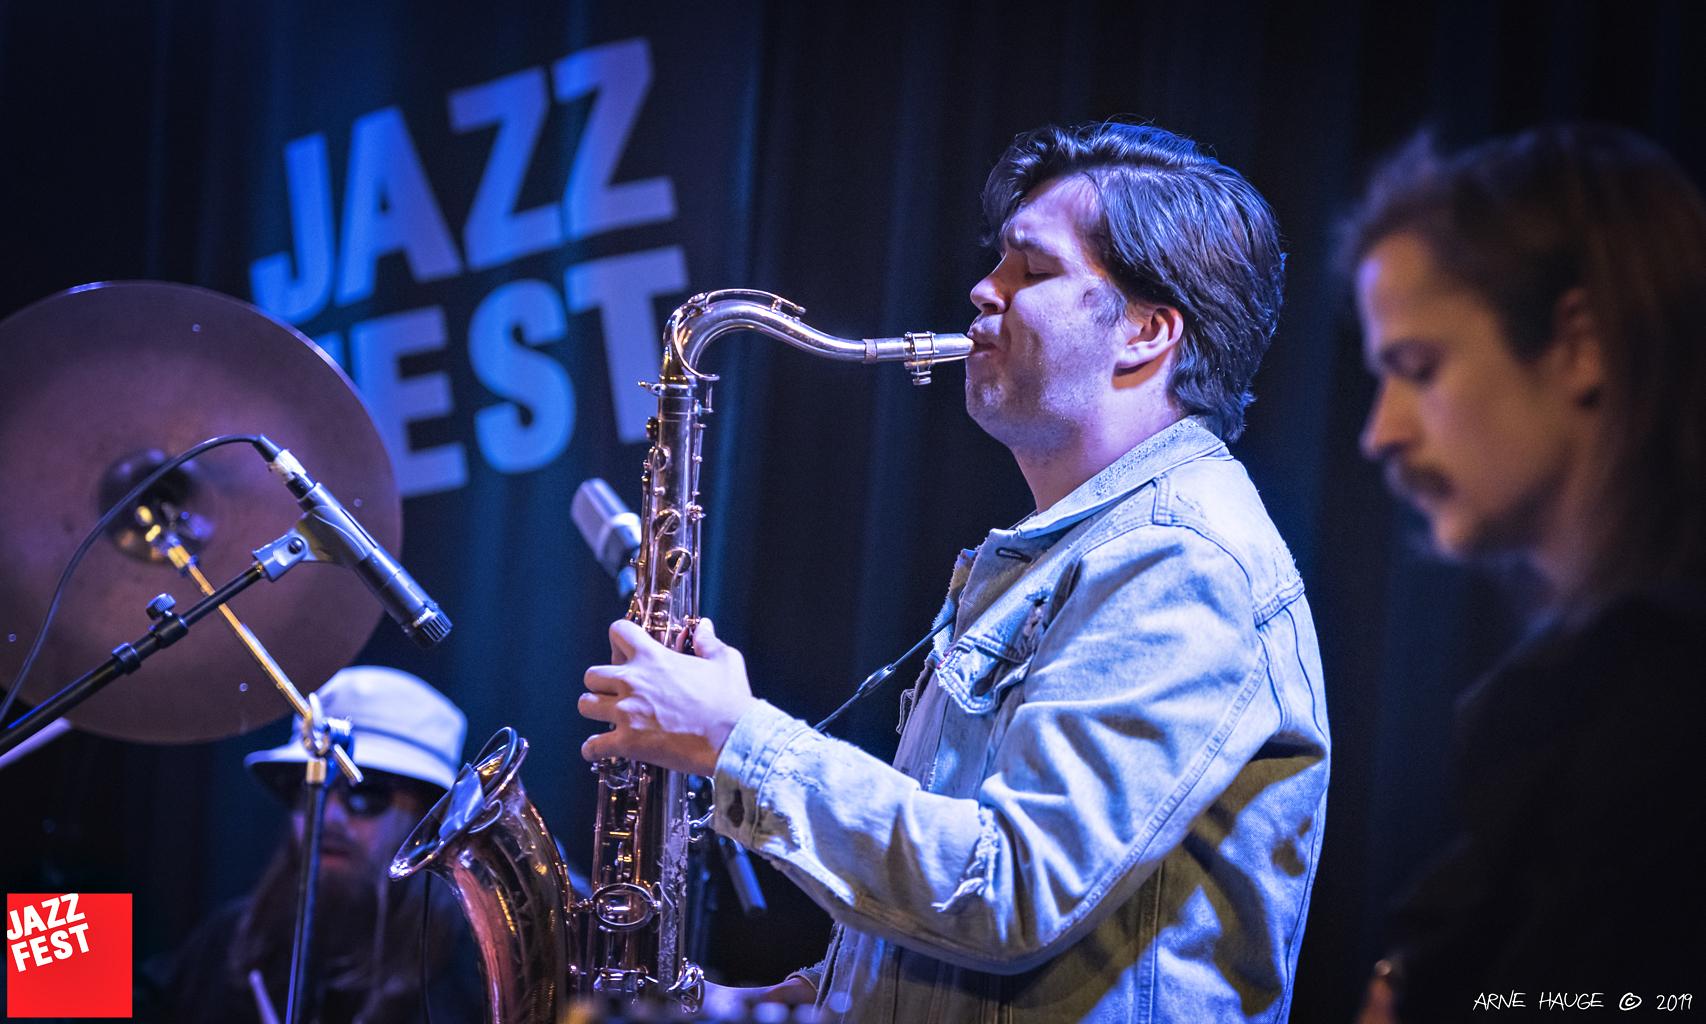 190510 Natalie Sandtorv (Jazz Expo) @ Dokkhuset - foto Arne Hauge_007.jpg